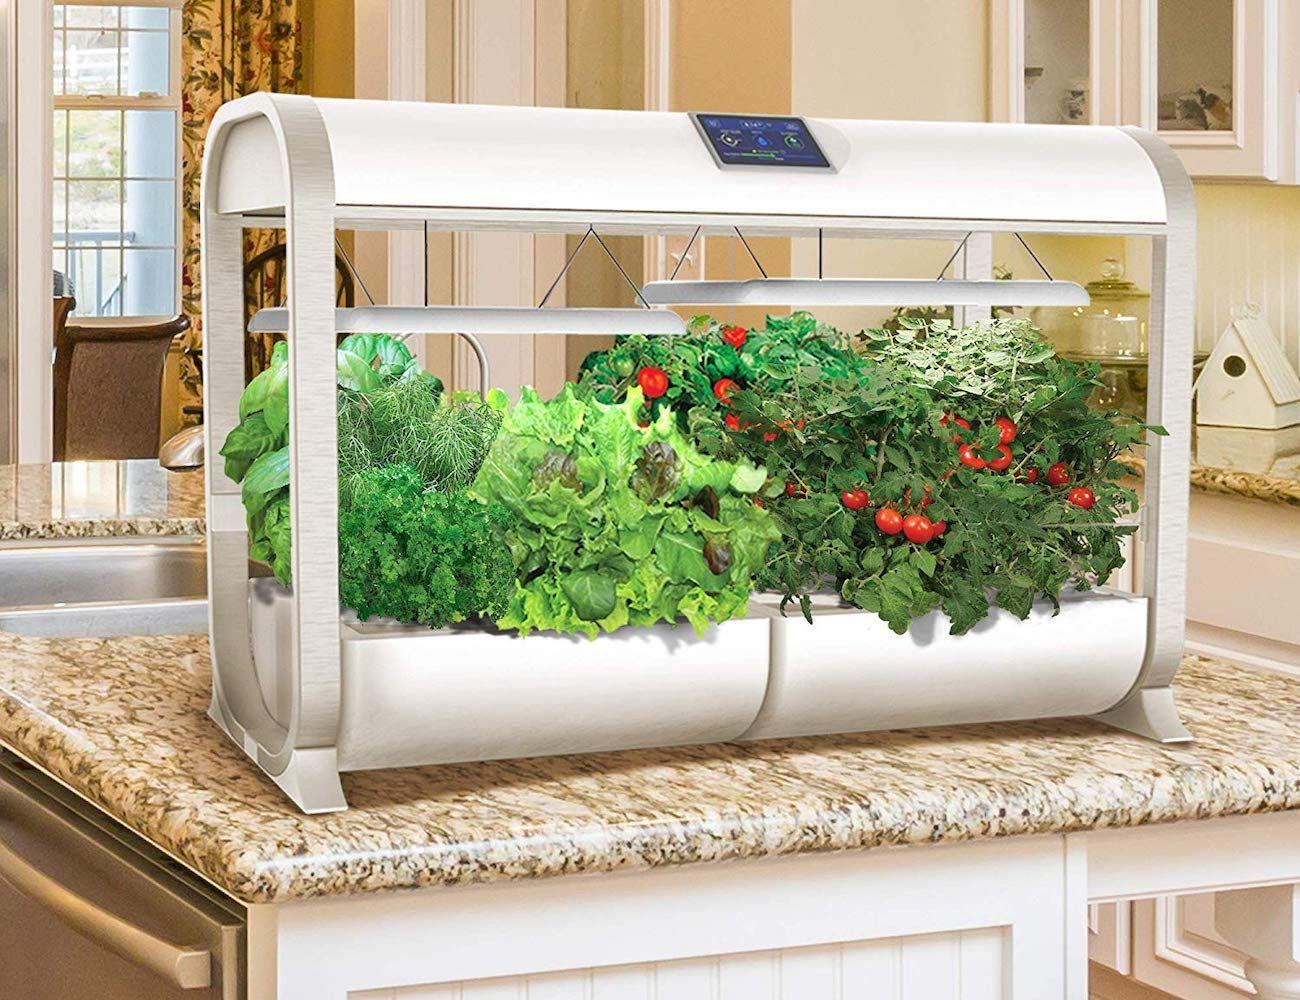 Aerogarden Farm Plus Smart Hydroponic Garden Lets You Grow 640 x 480